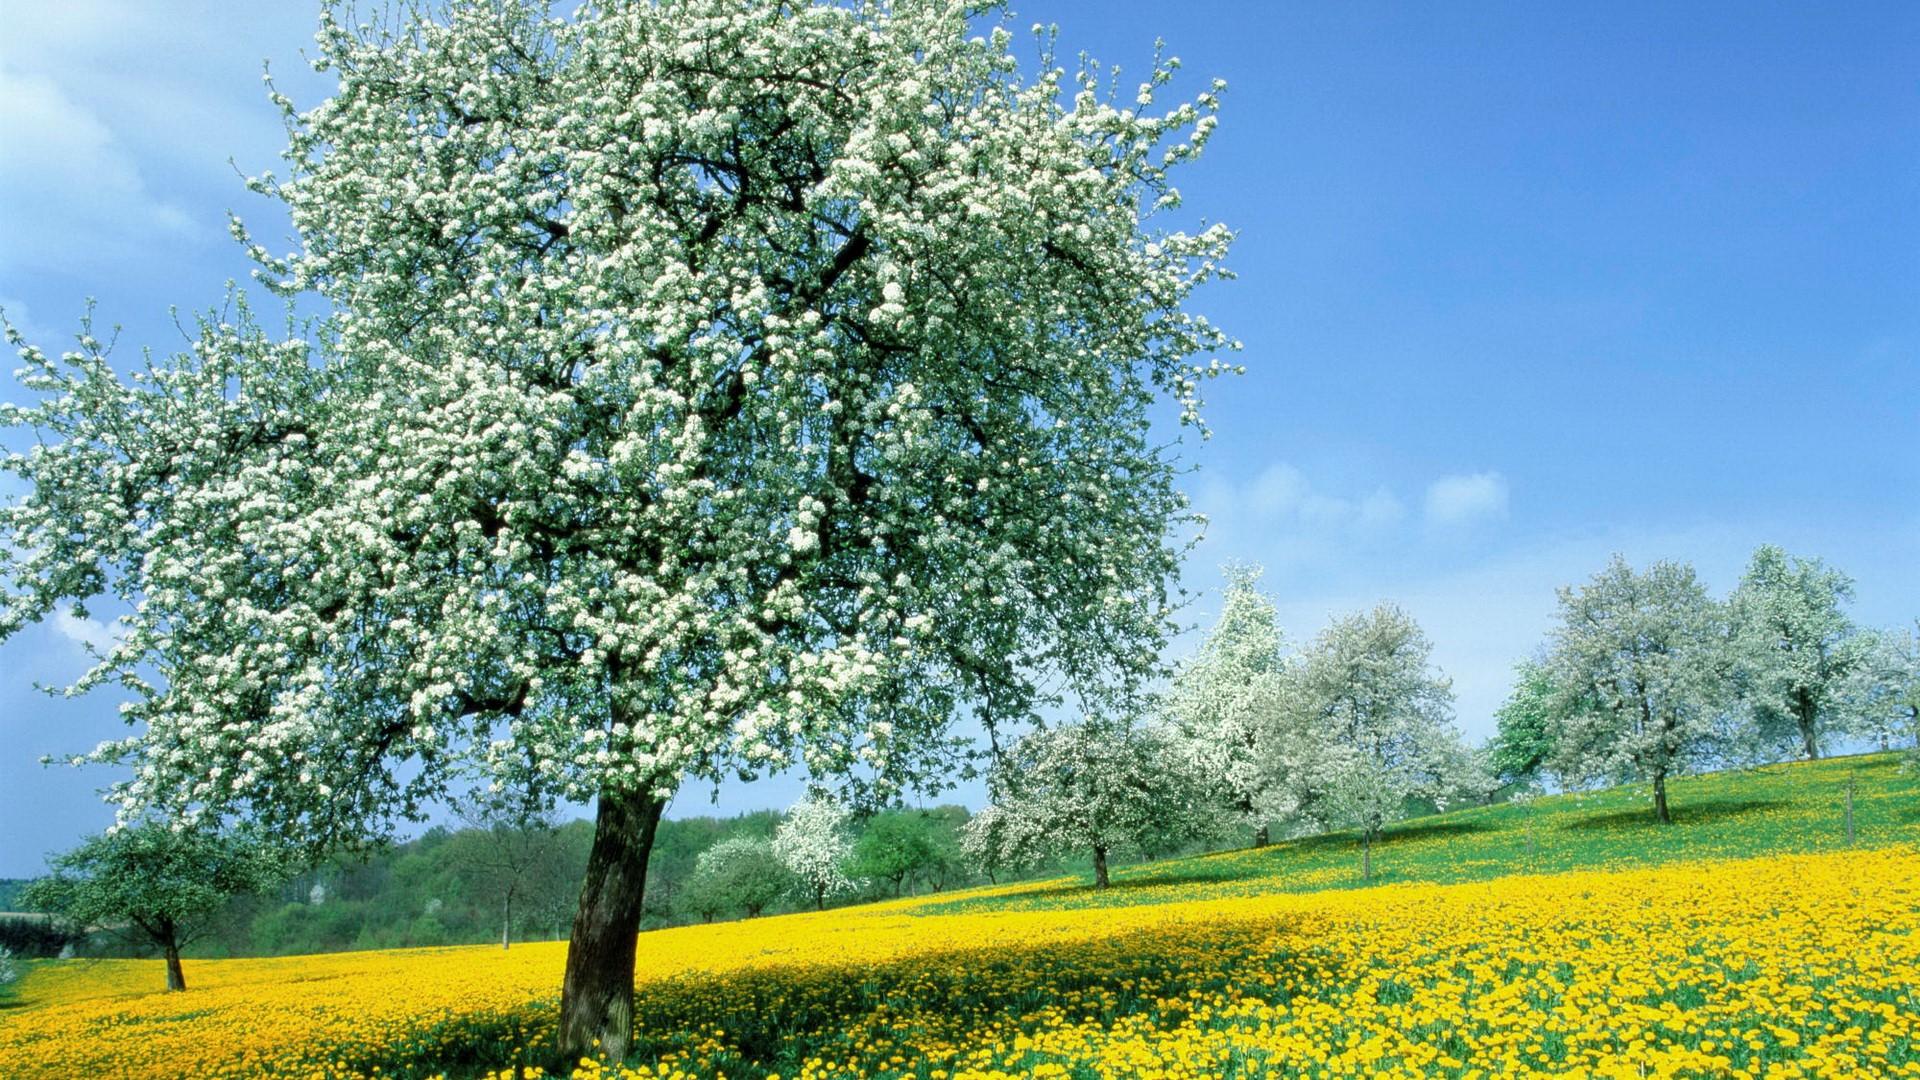 beautiful spring trees wallpaper - photo #20